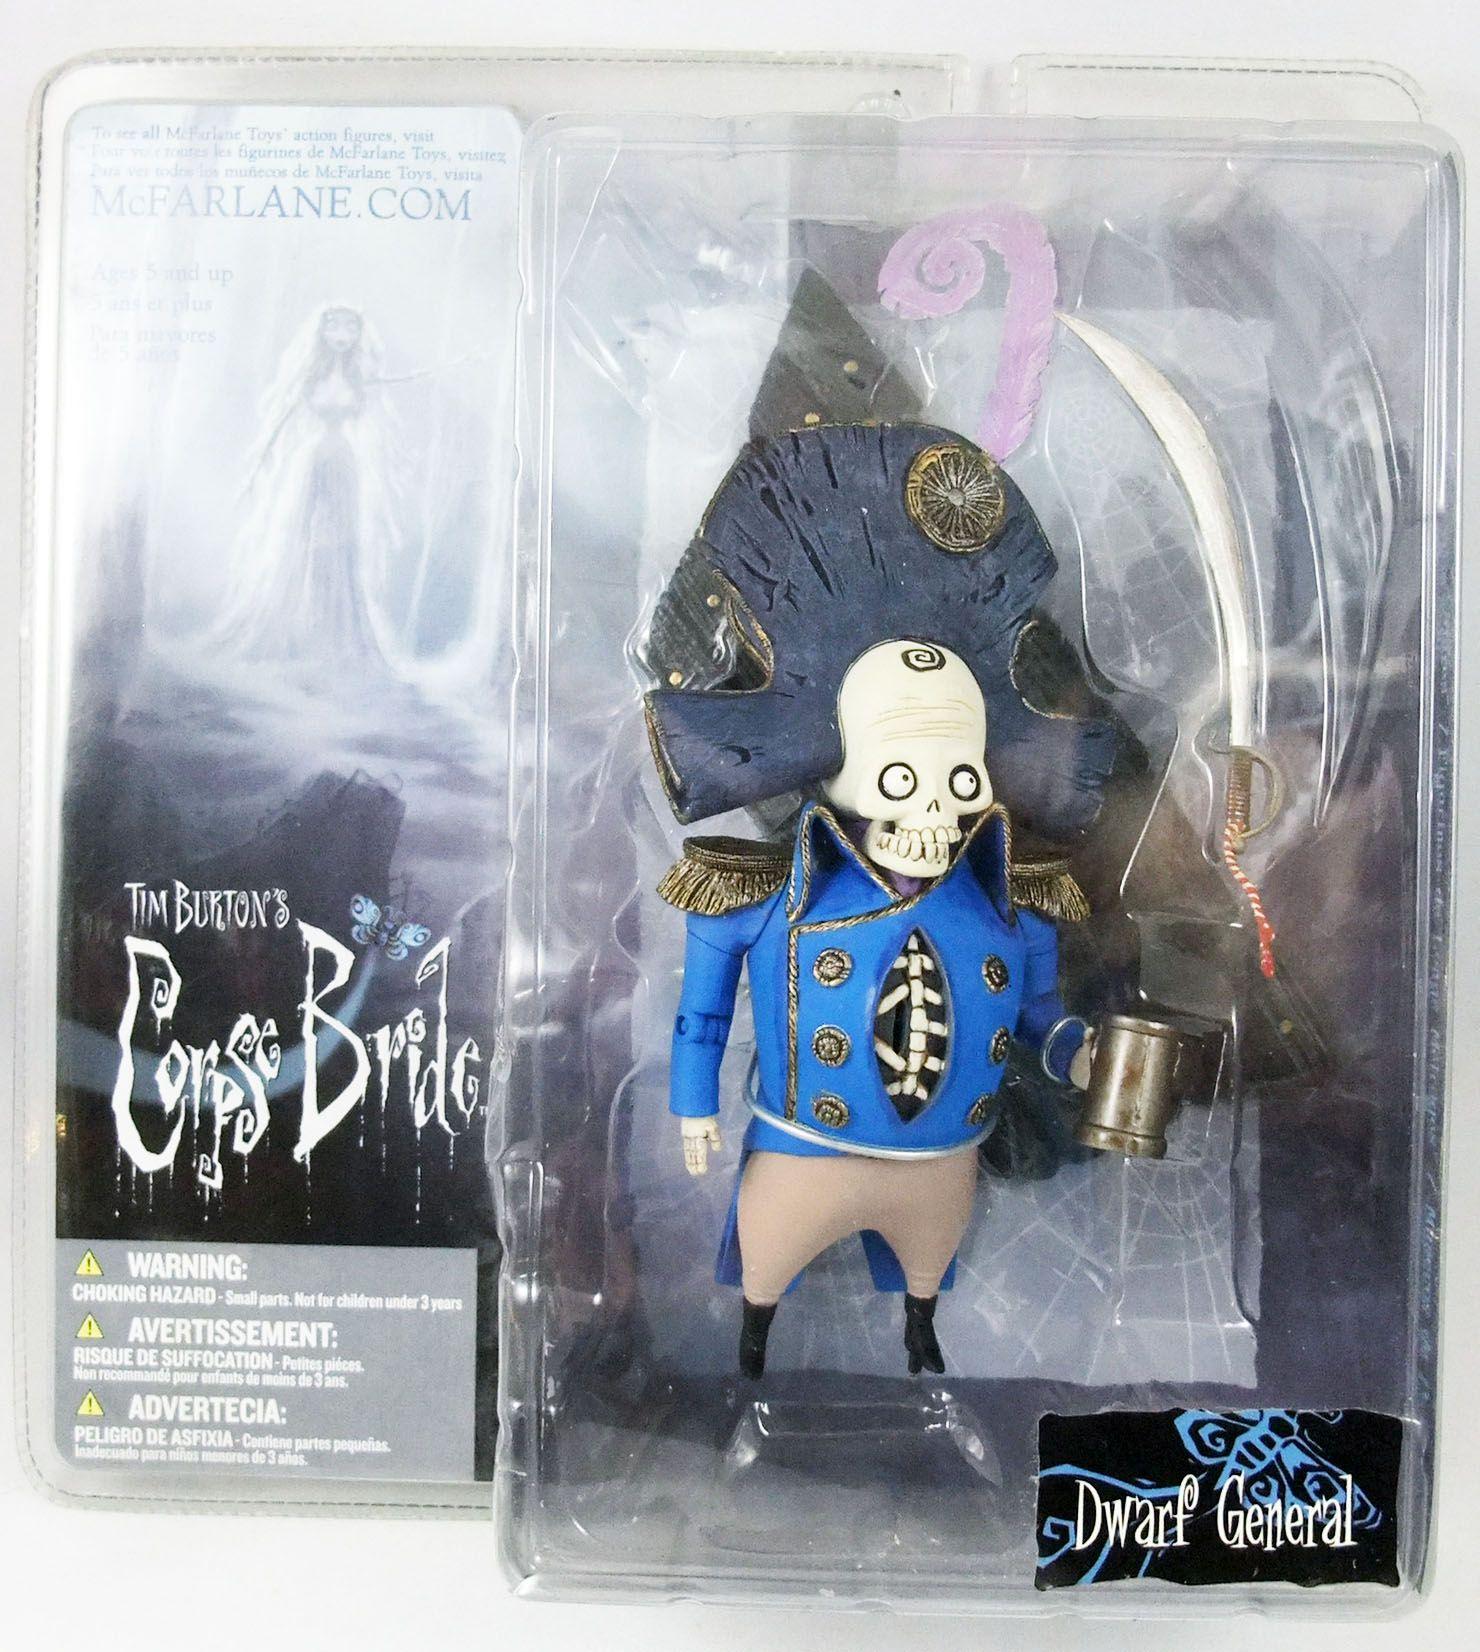 Noces Funebres - McFarlane Toys - Dwarf Général Bonesapart